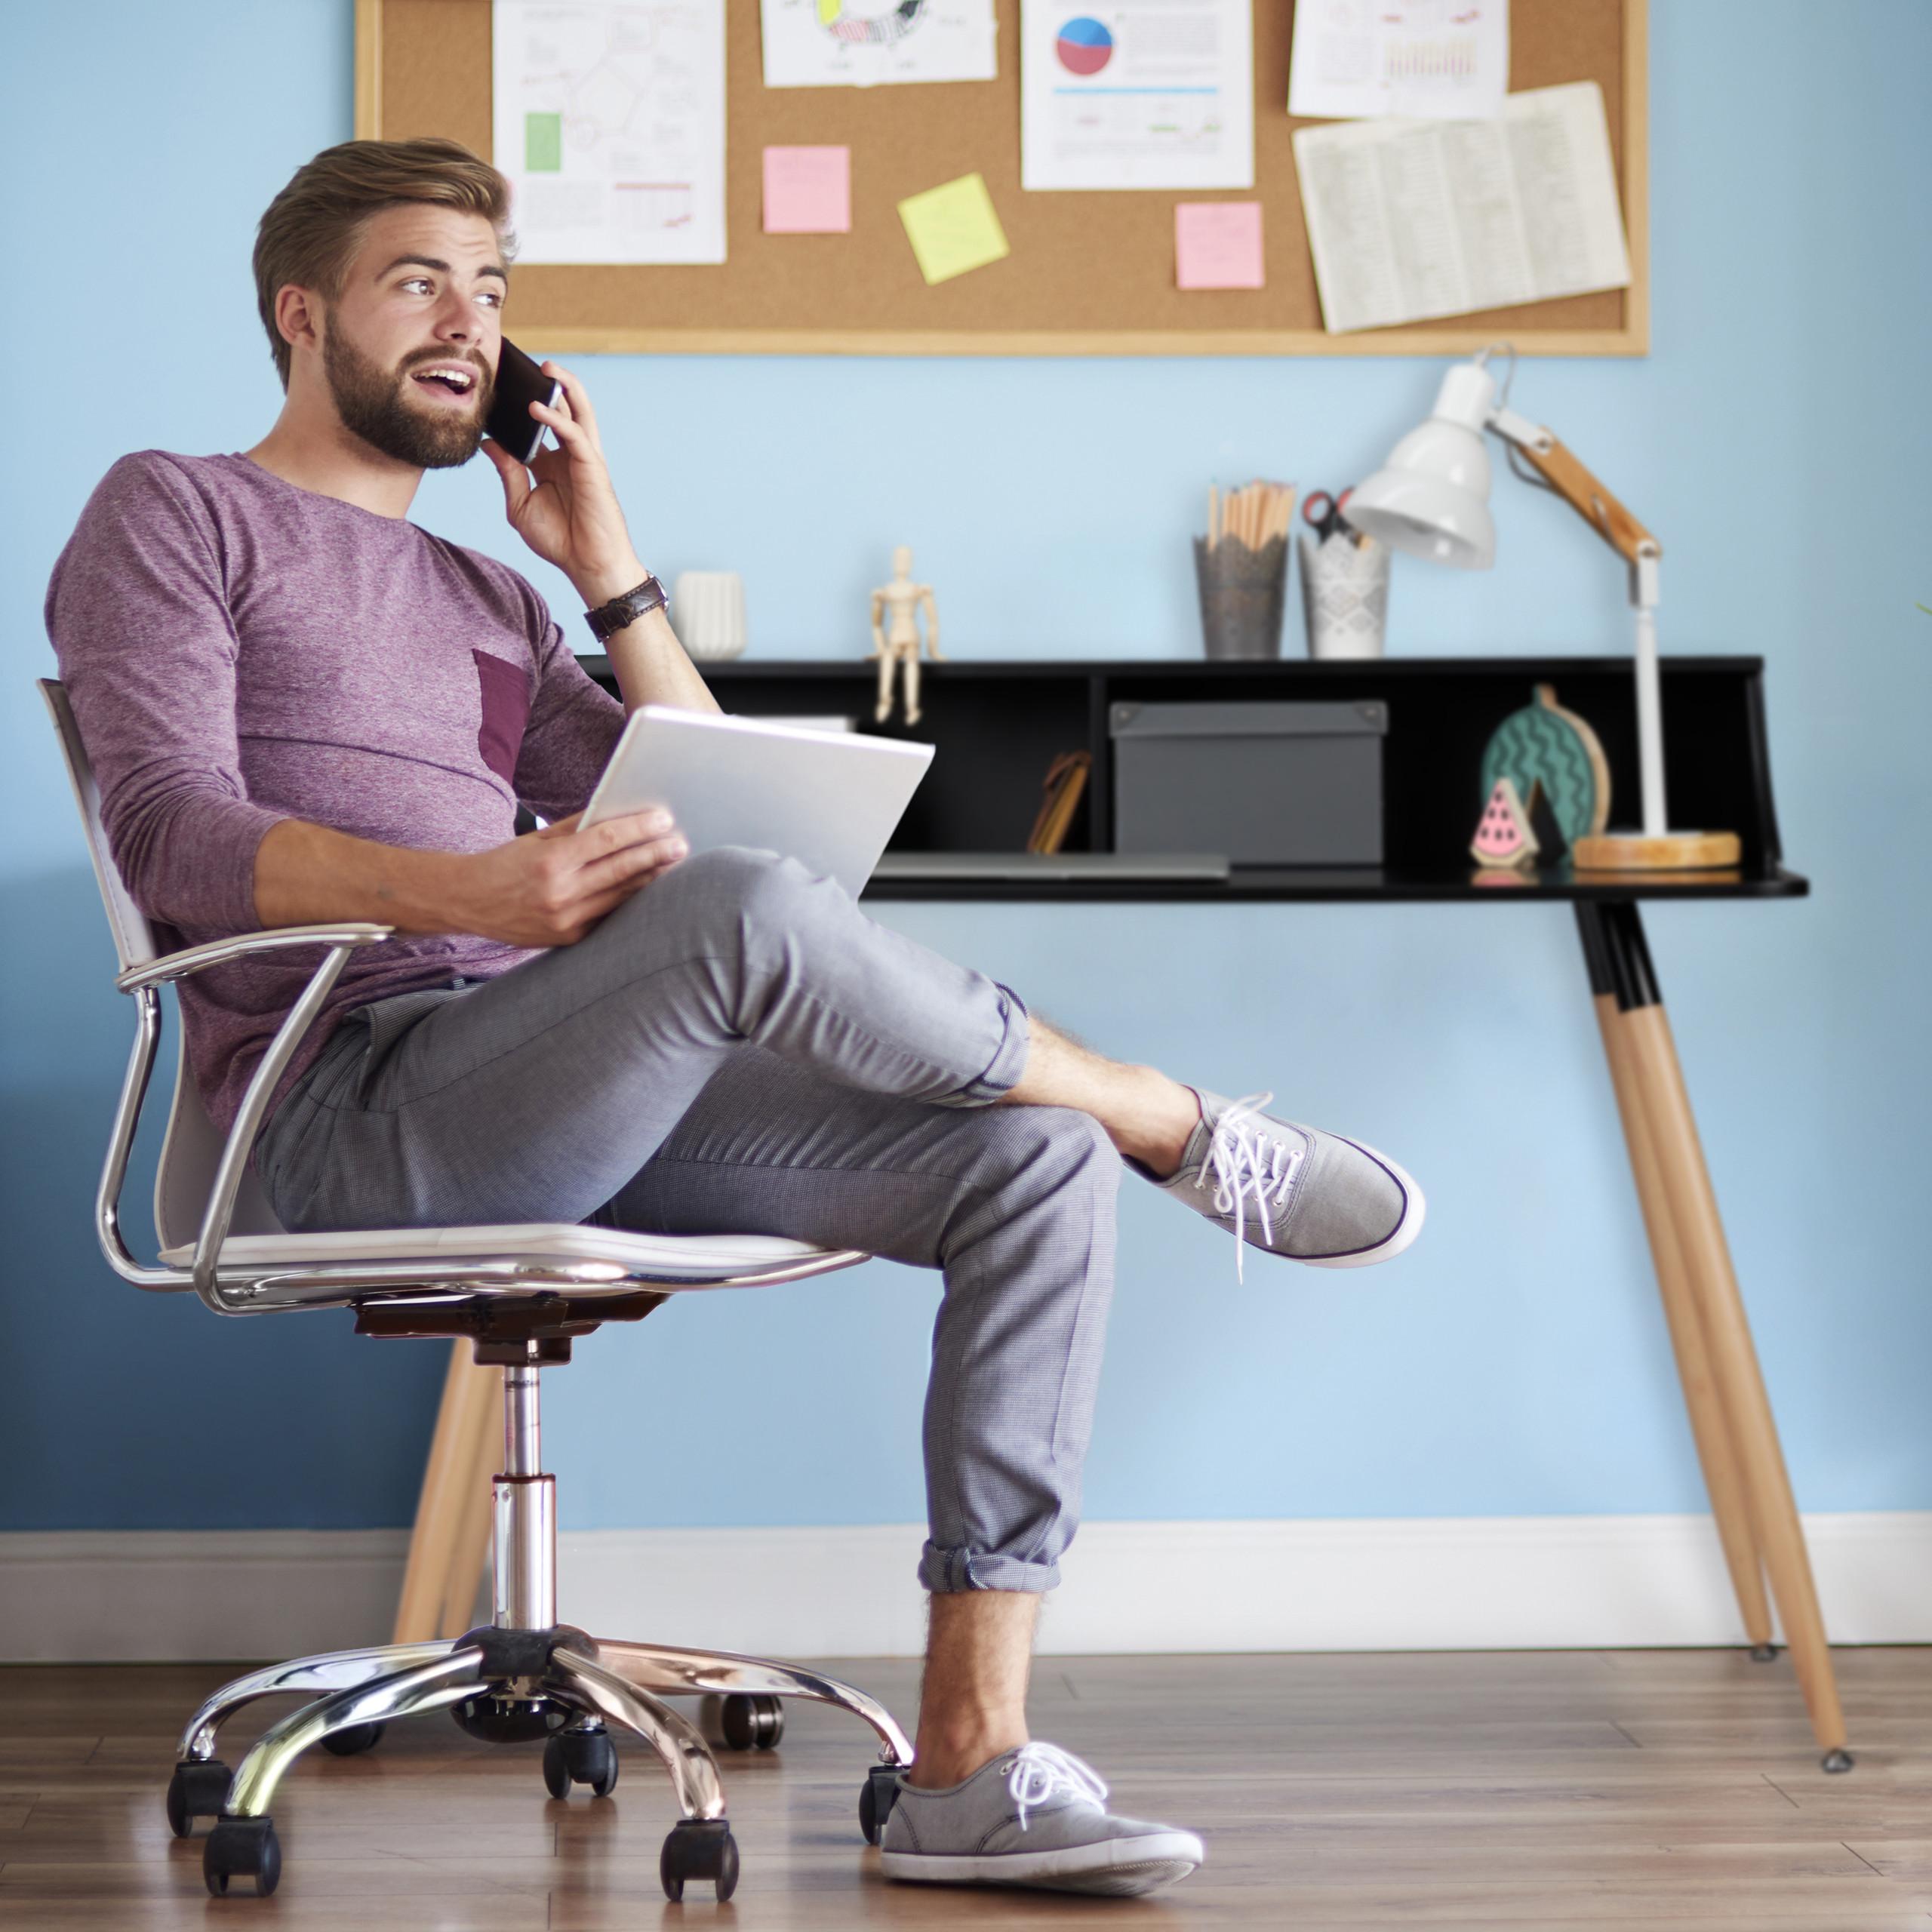 bureau-kinderbureau-ruimtebesparend-75-cm-hoog-laptoptafel-120-breed miniatuur 5